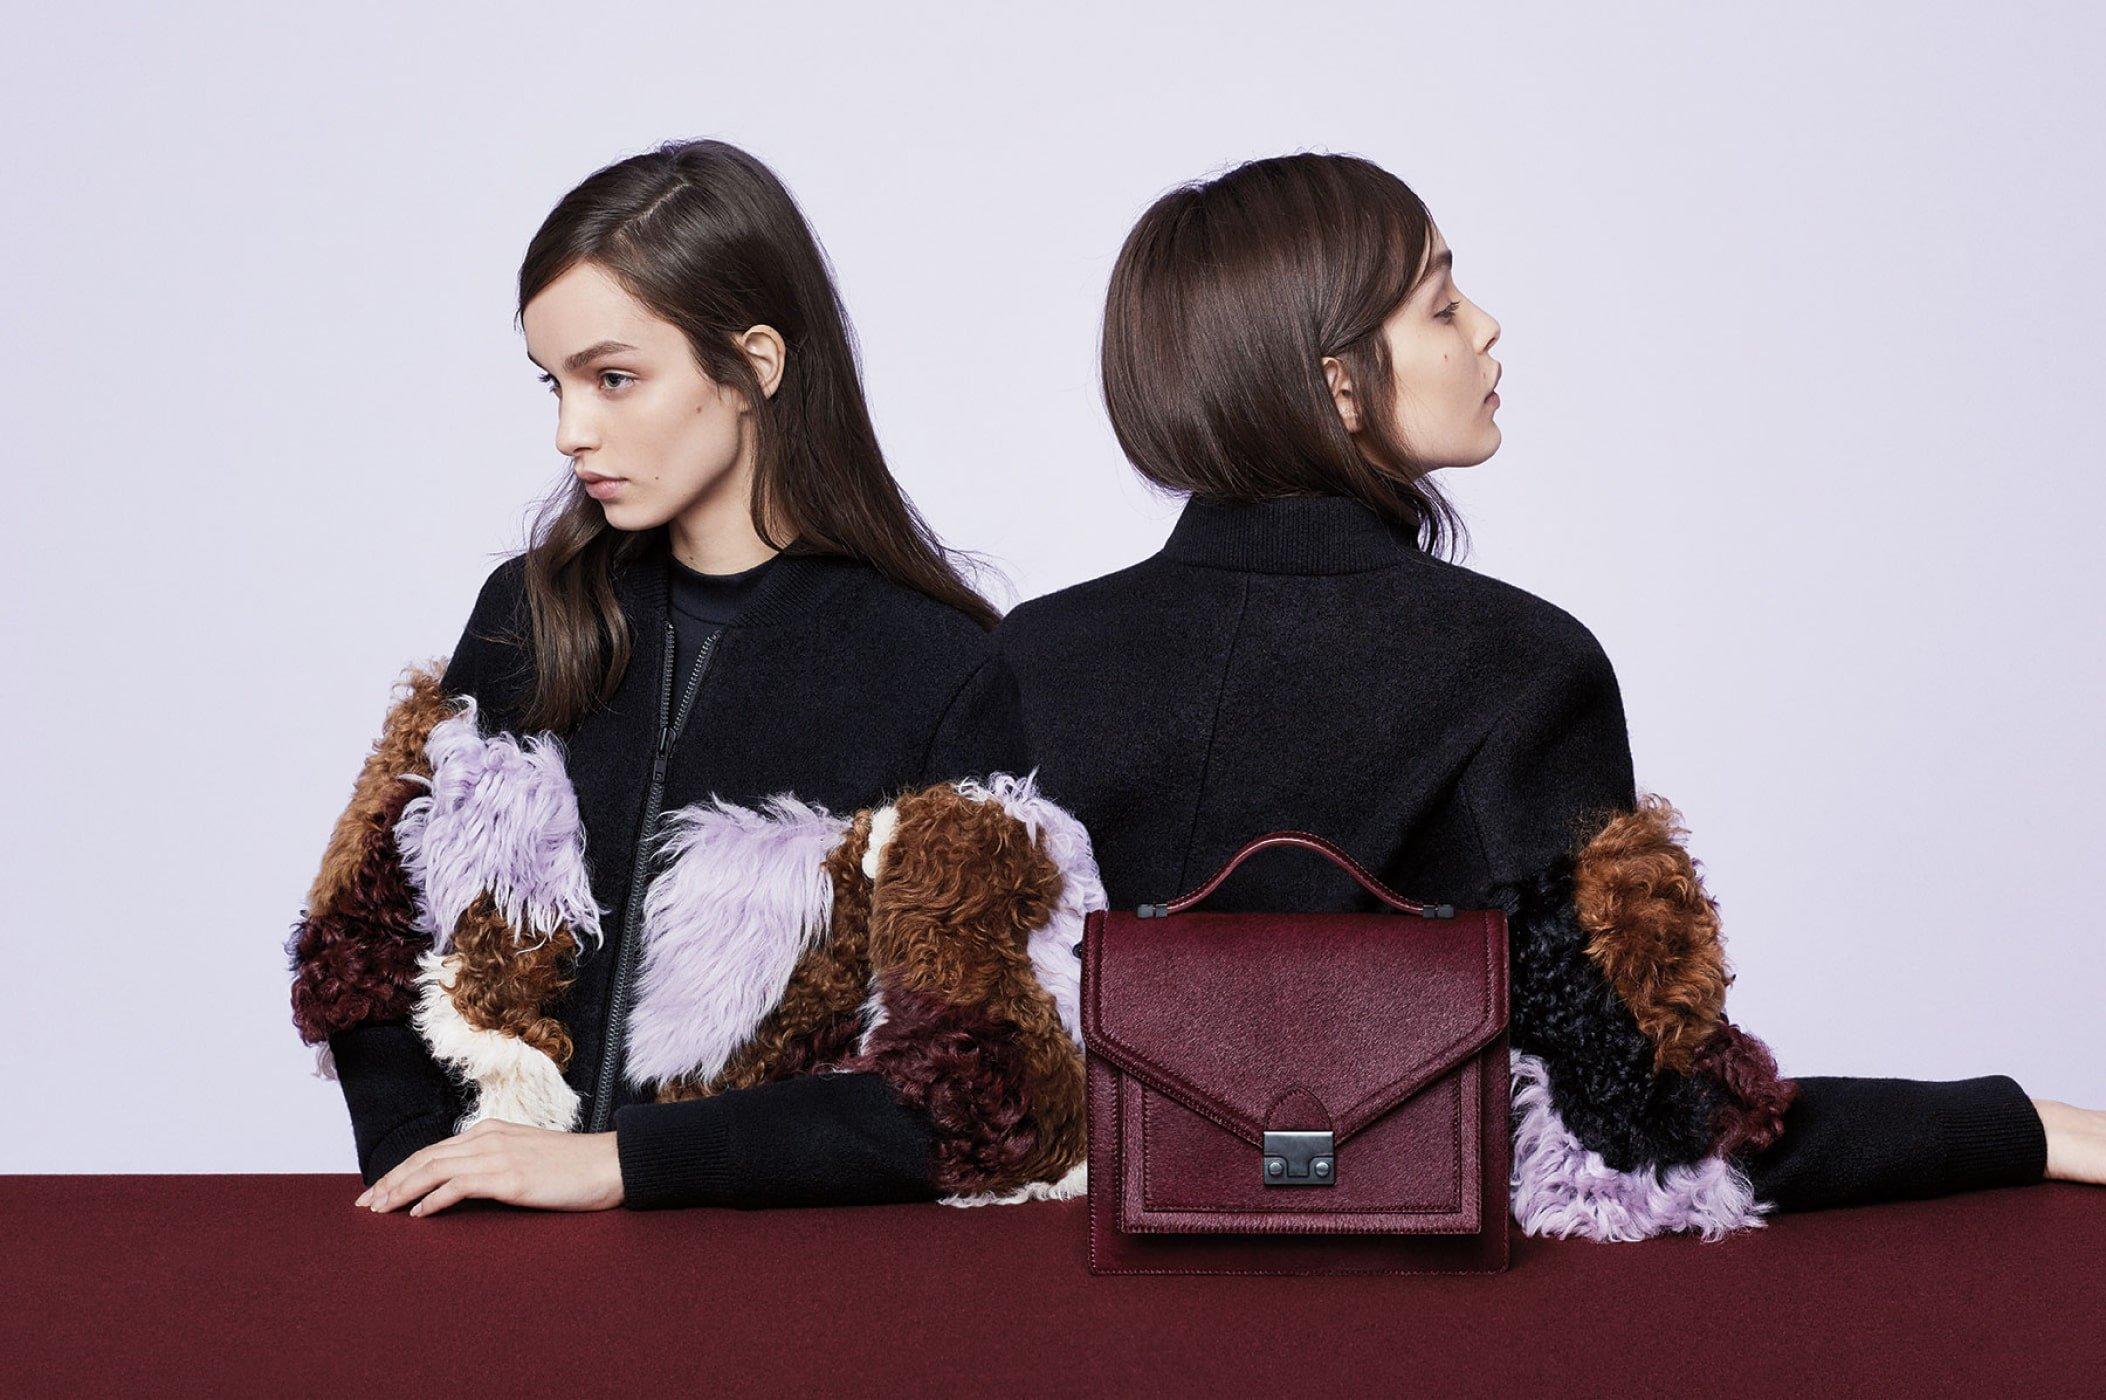 Models wearing fringe jacket featuring maroon Loeffler Randall purse. Art direction by RoAndCo